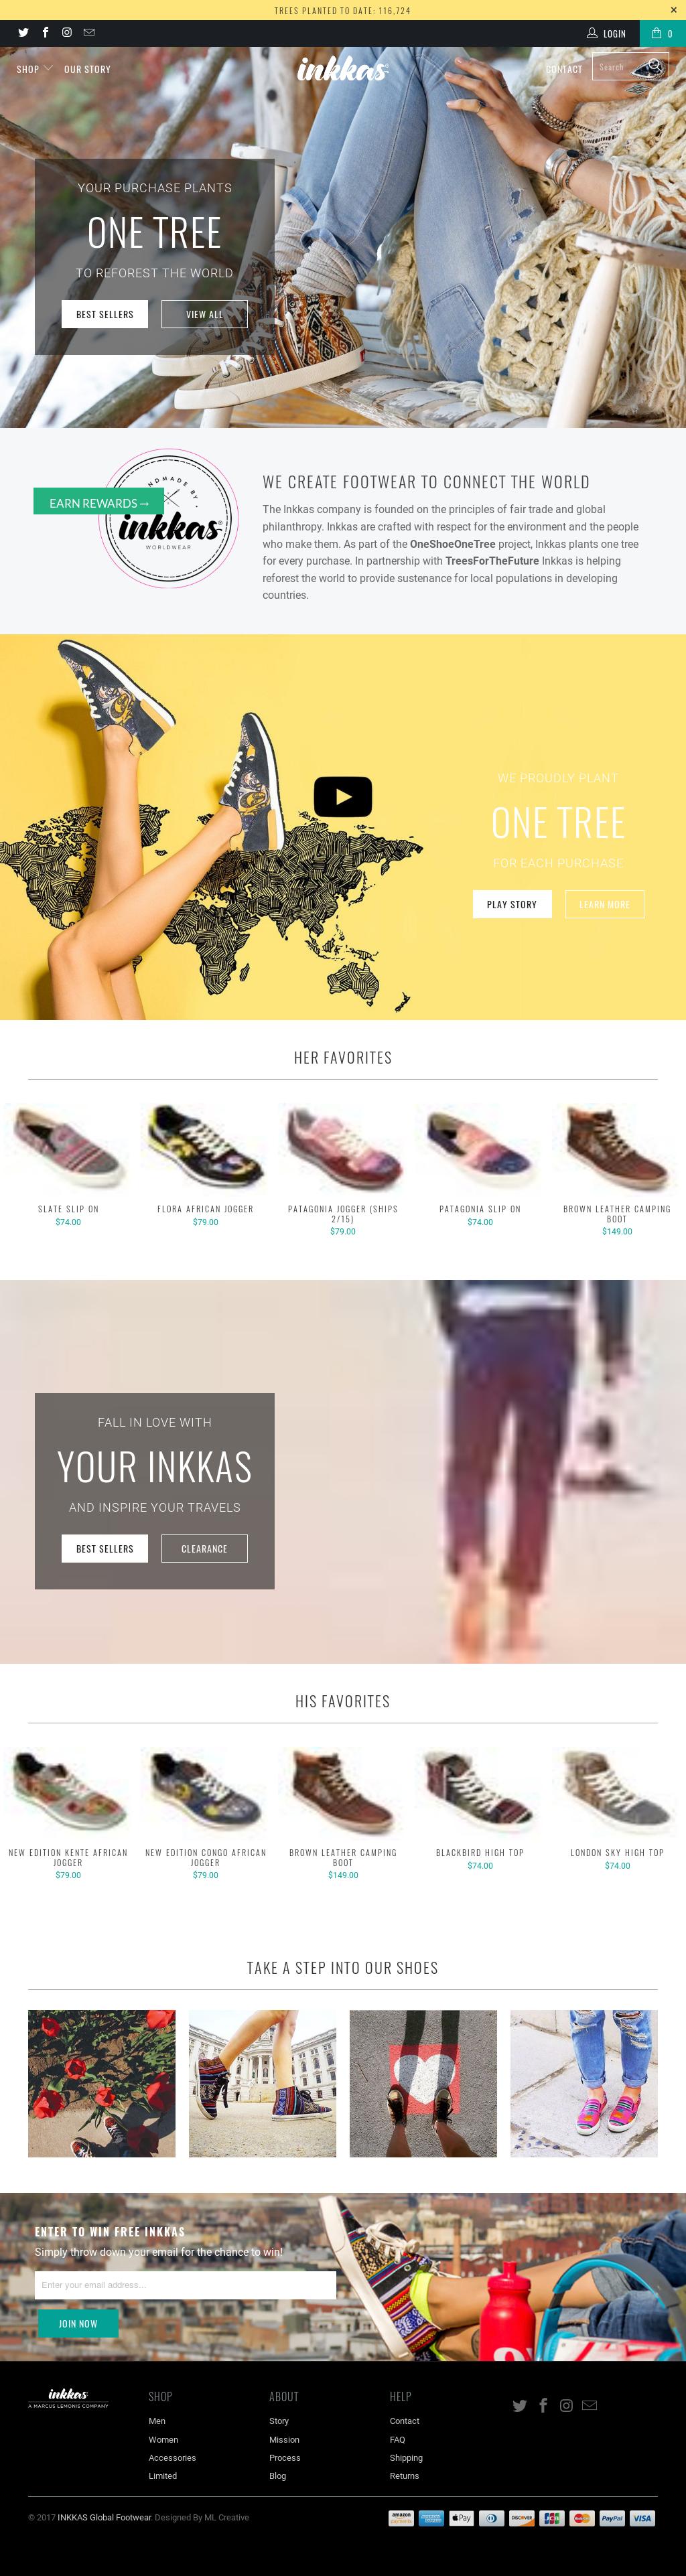 89eba58bc1 Owler Reports - Press Release  Inkkas   Flex Watches and Inkkas Worldwear footwear  launch Star Wars themed collections